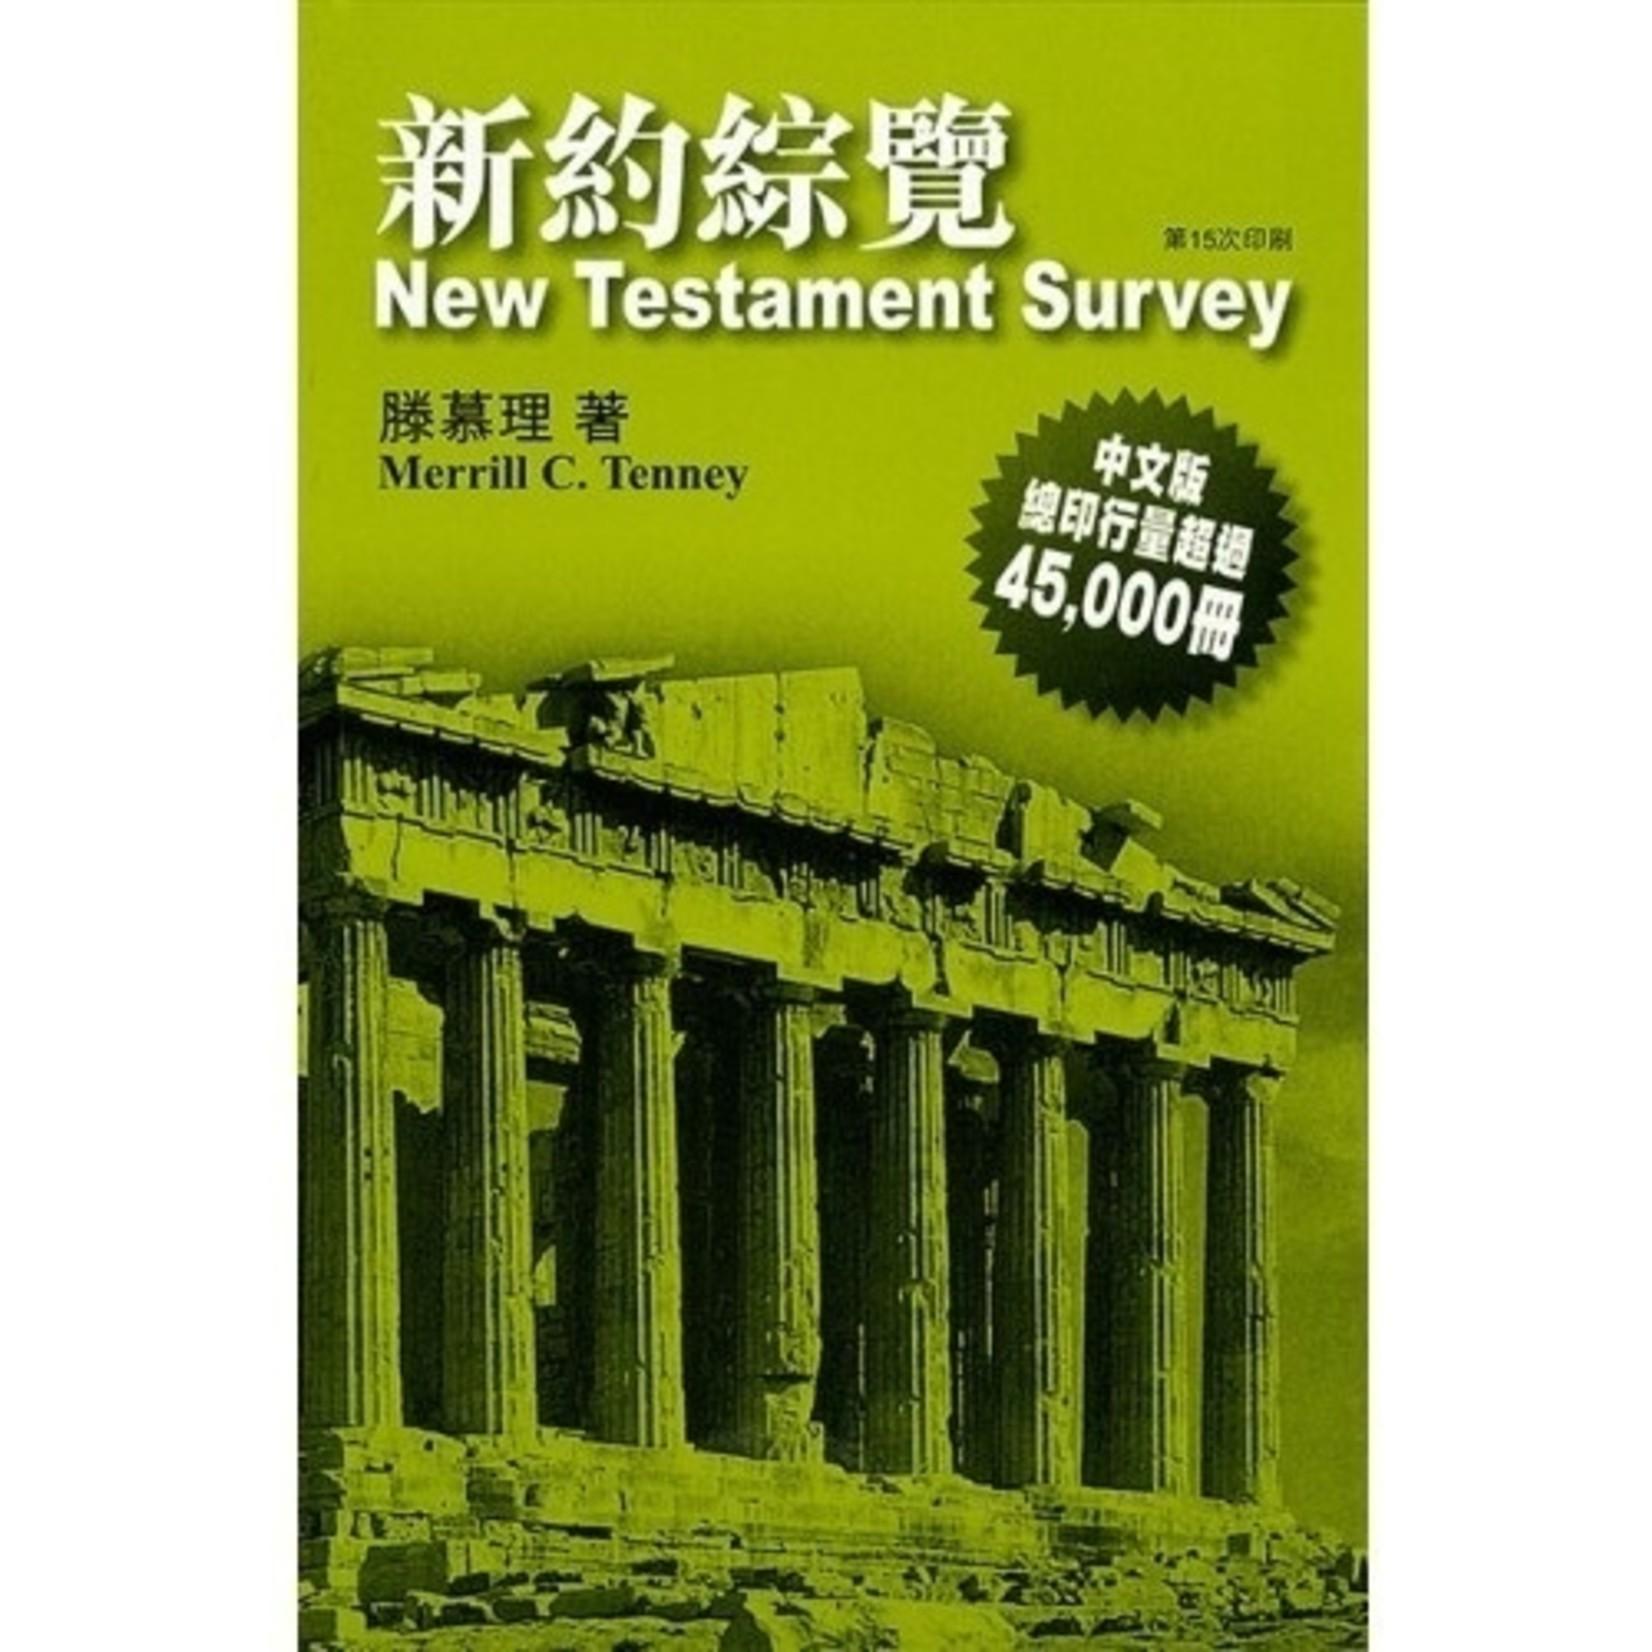 宣道 China Alliance Press 新約綜覽 New Testament Survey